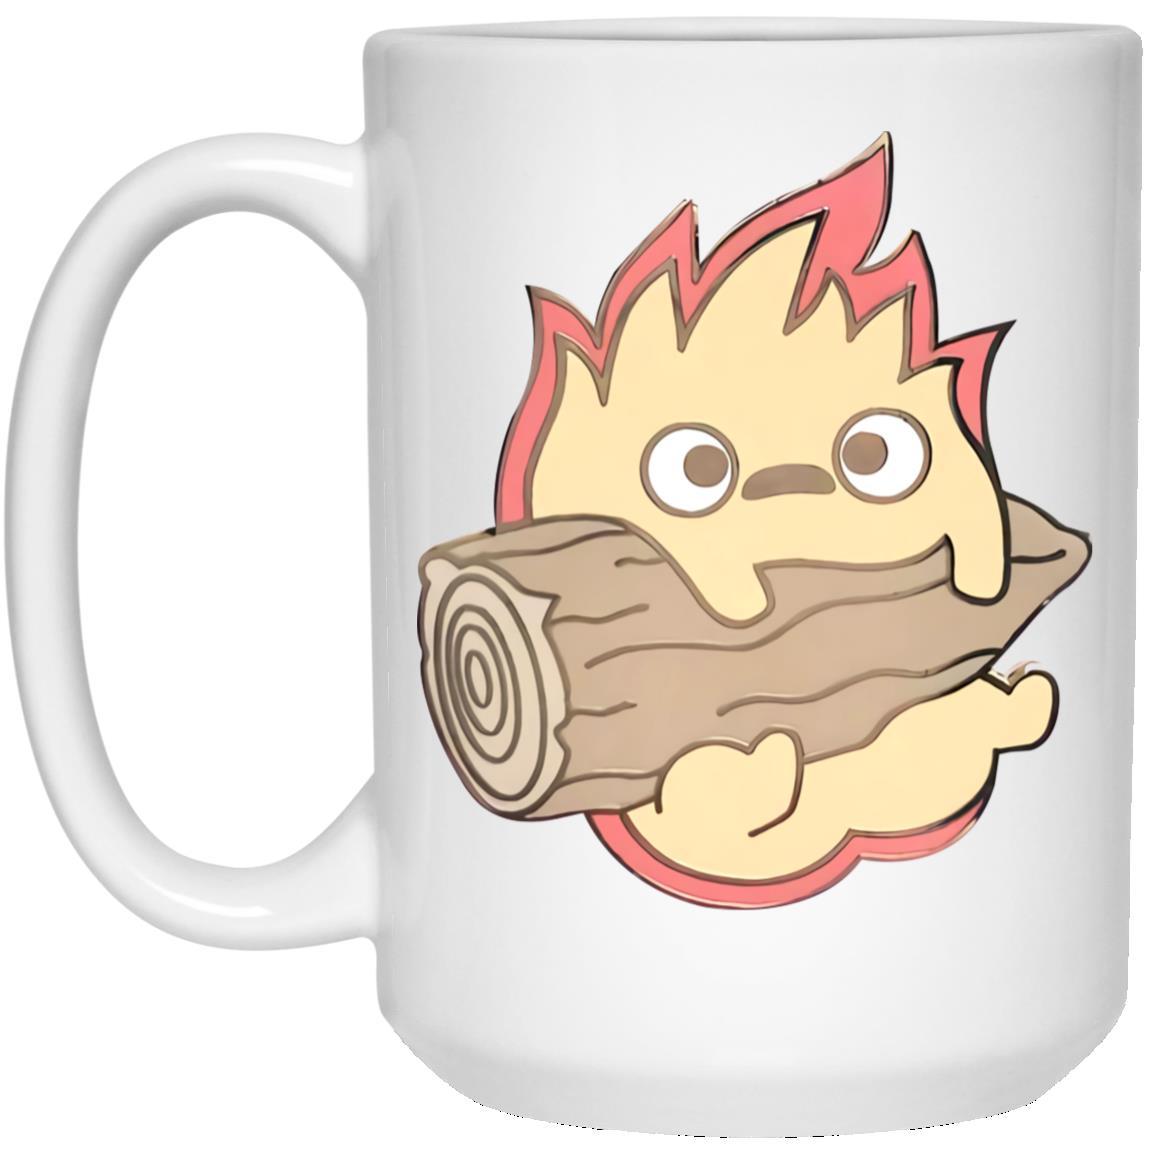 Howl's Moving Castle – Calcifer Chibi Mug